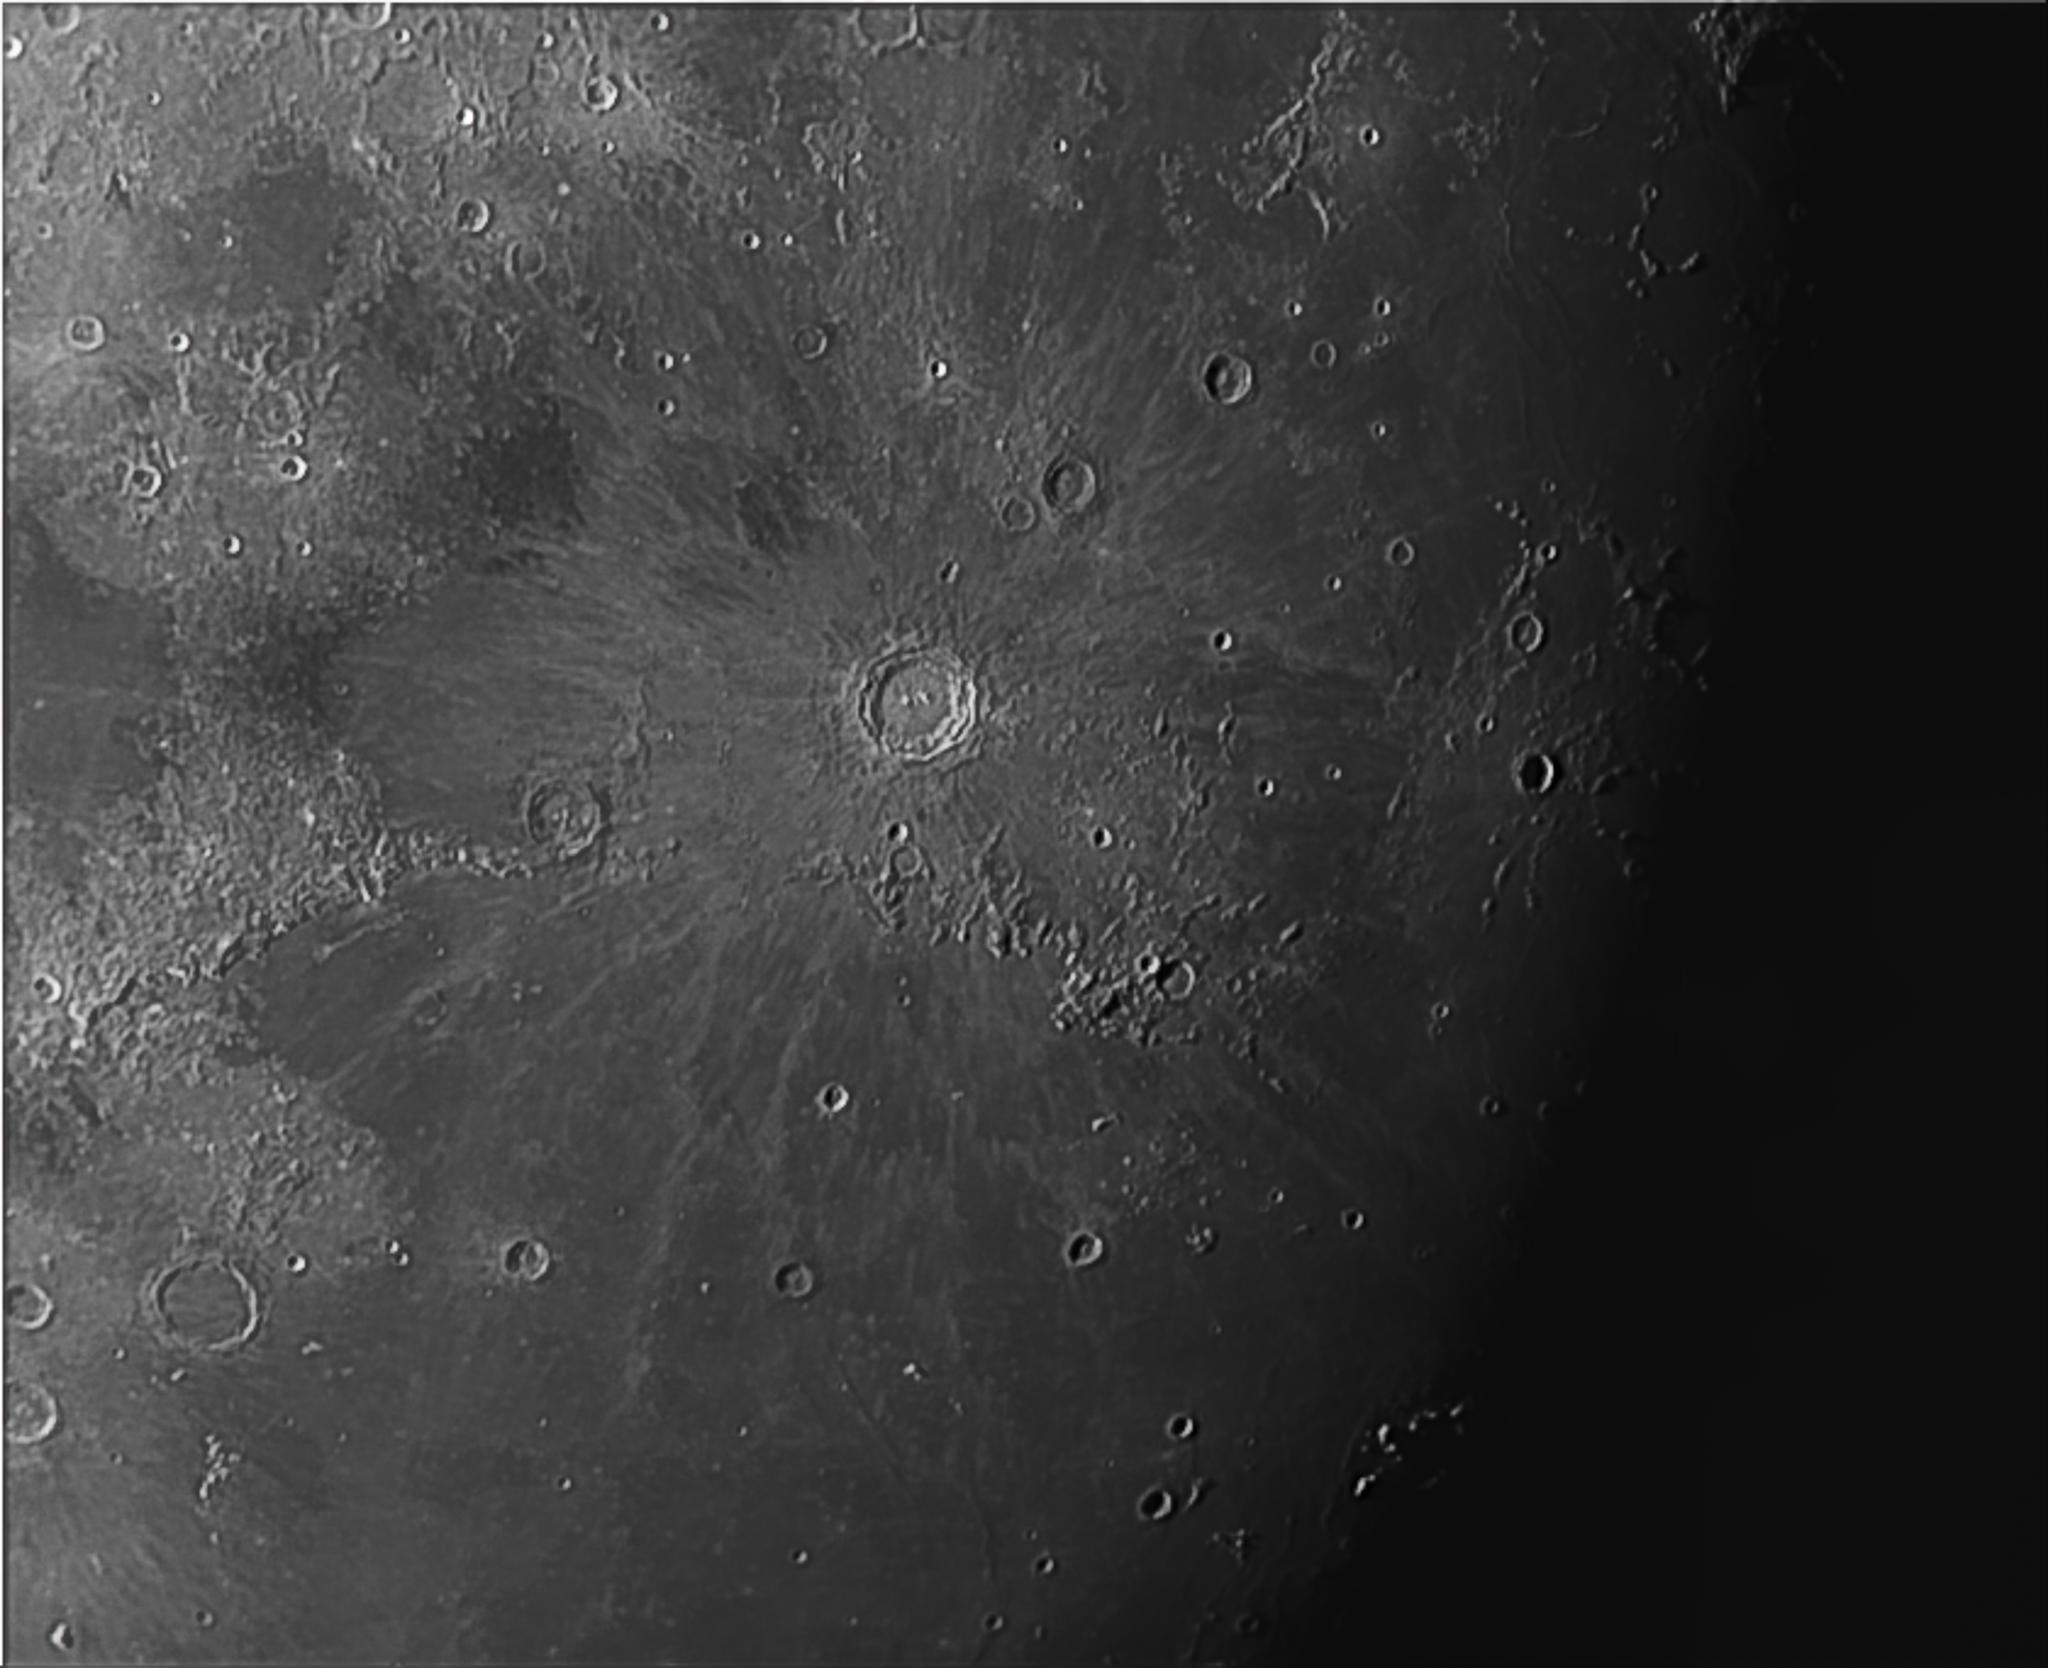 copernicus, moon, lunar